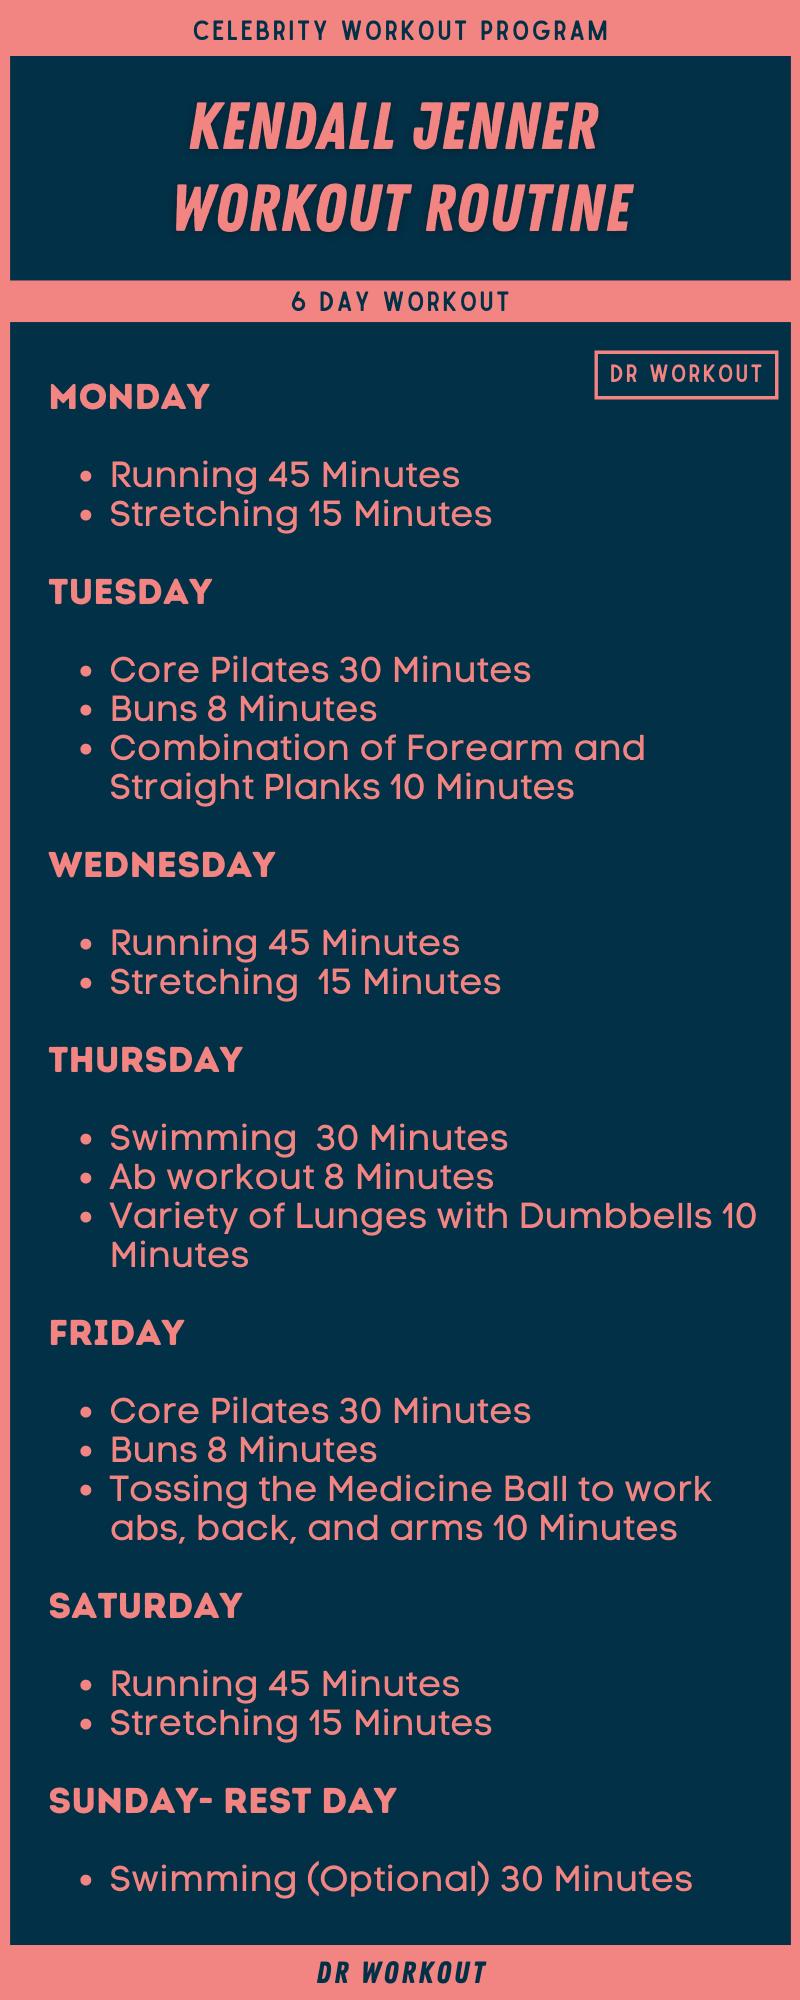 Kendall Jenner Workout Plan